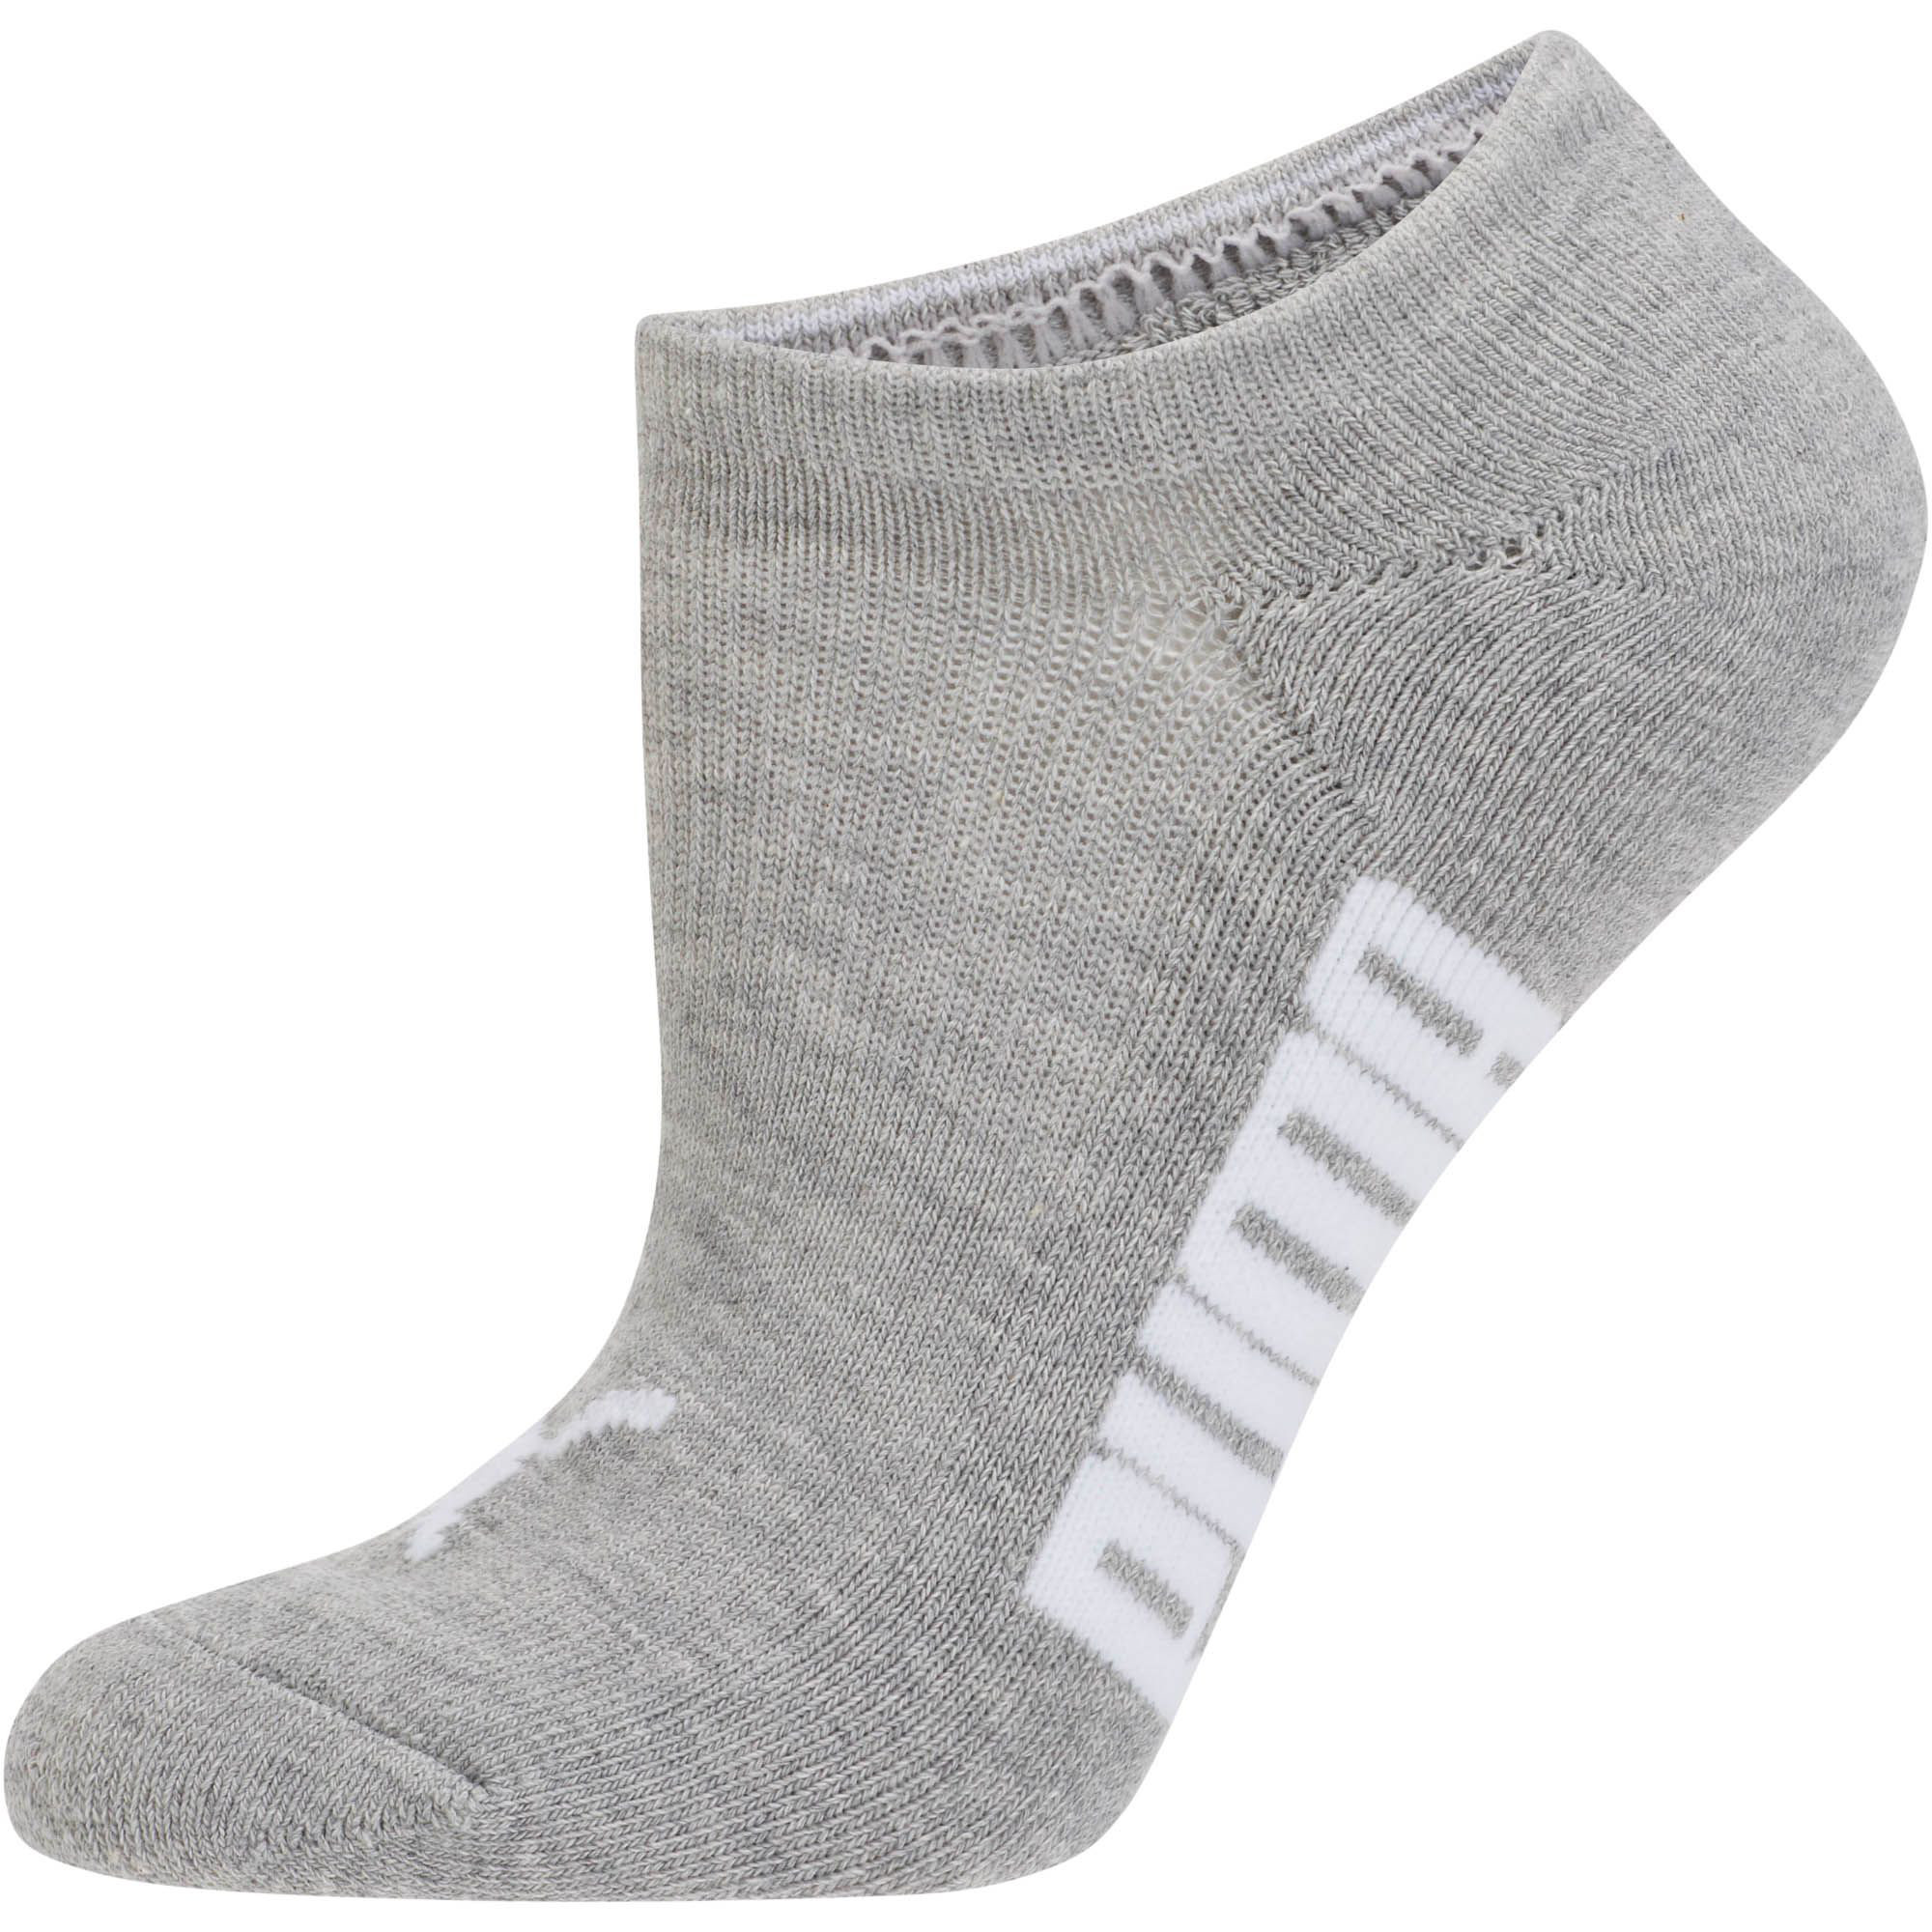 Licence-Women-s-Invisible-No-Show-Socks-3-Pack-Women-Socks-3-Pack thumbnail 3